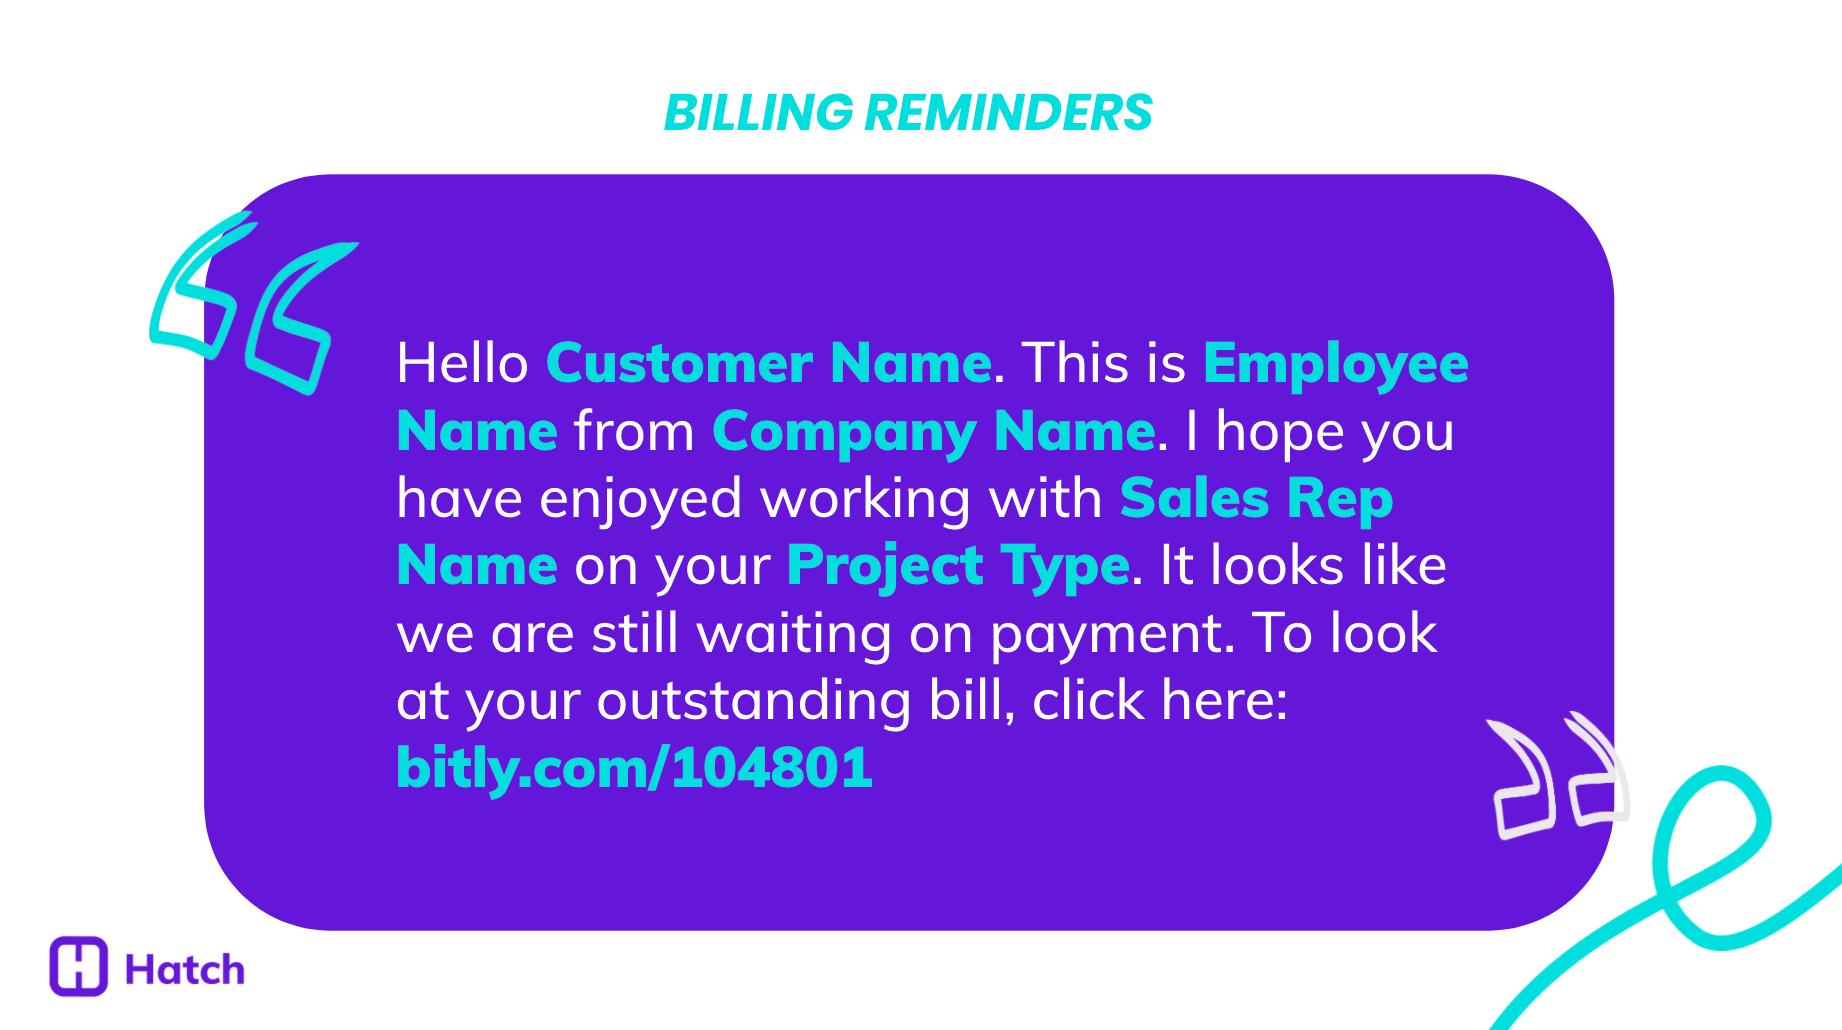 Billing Reminders